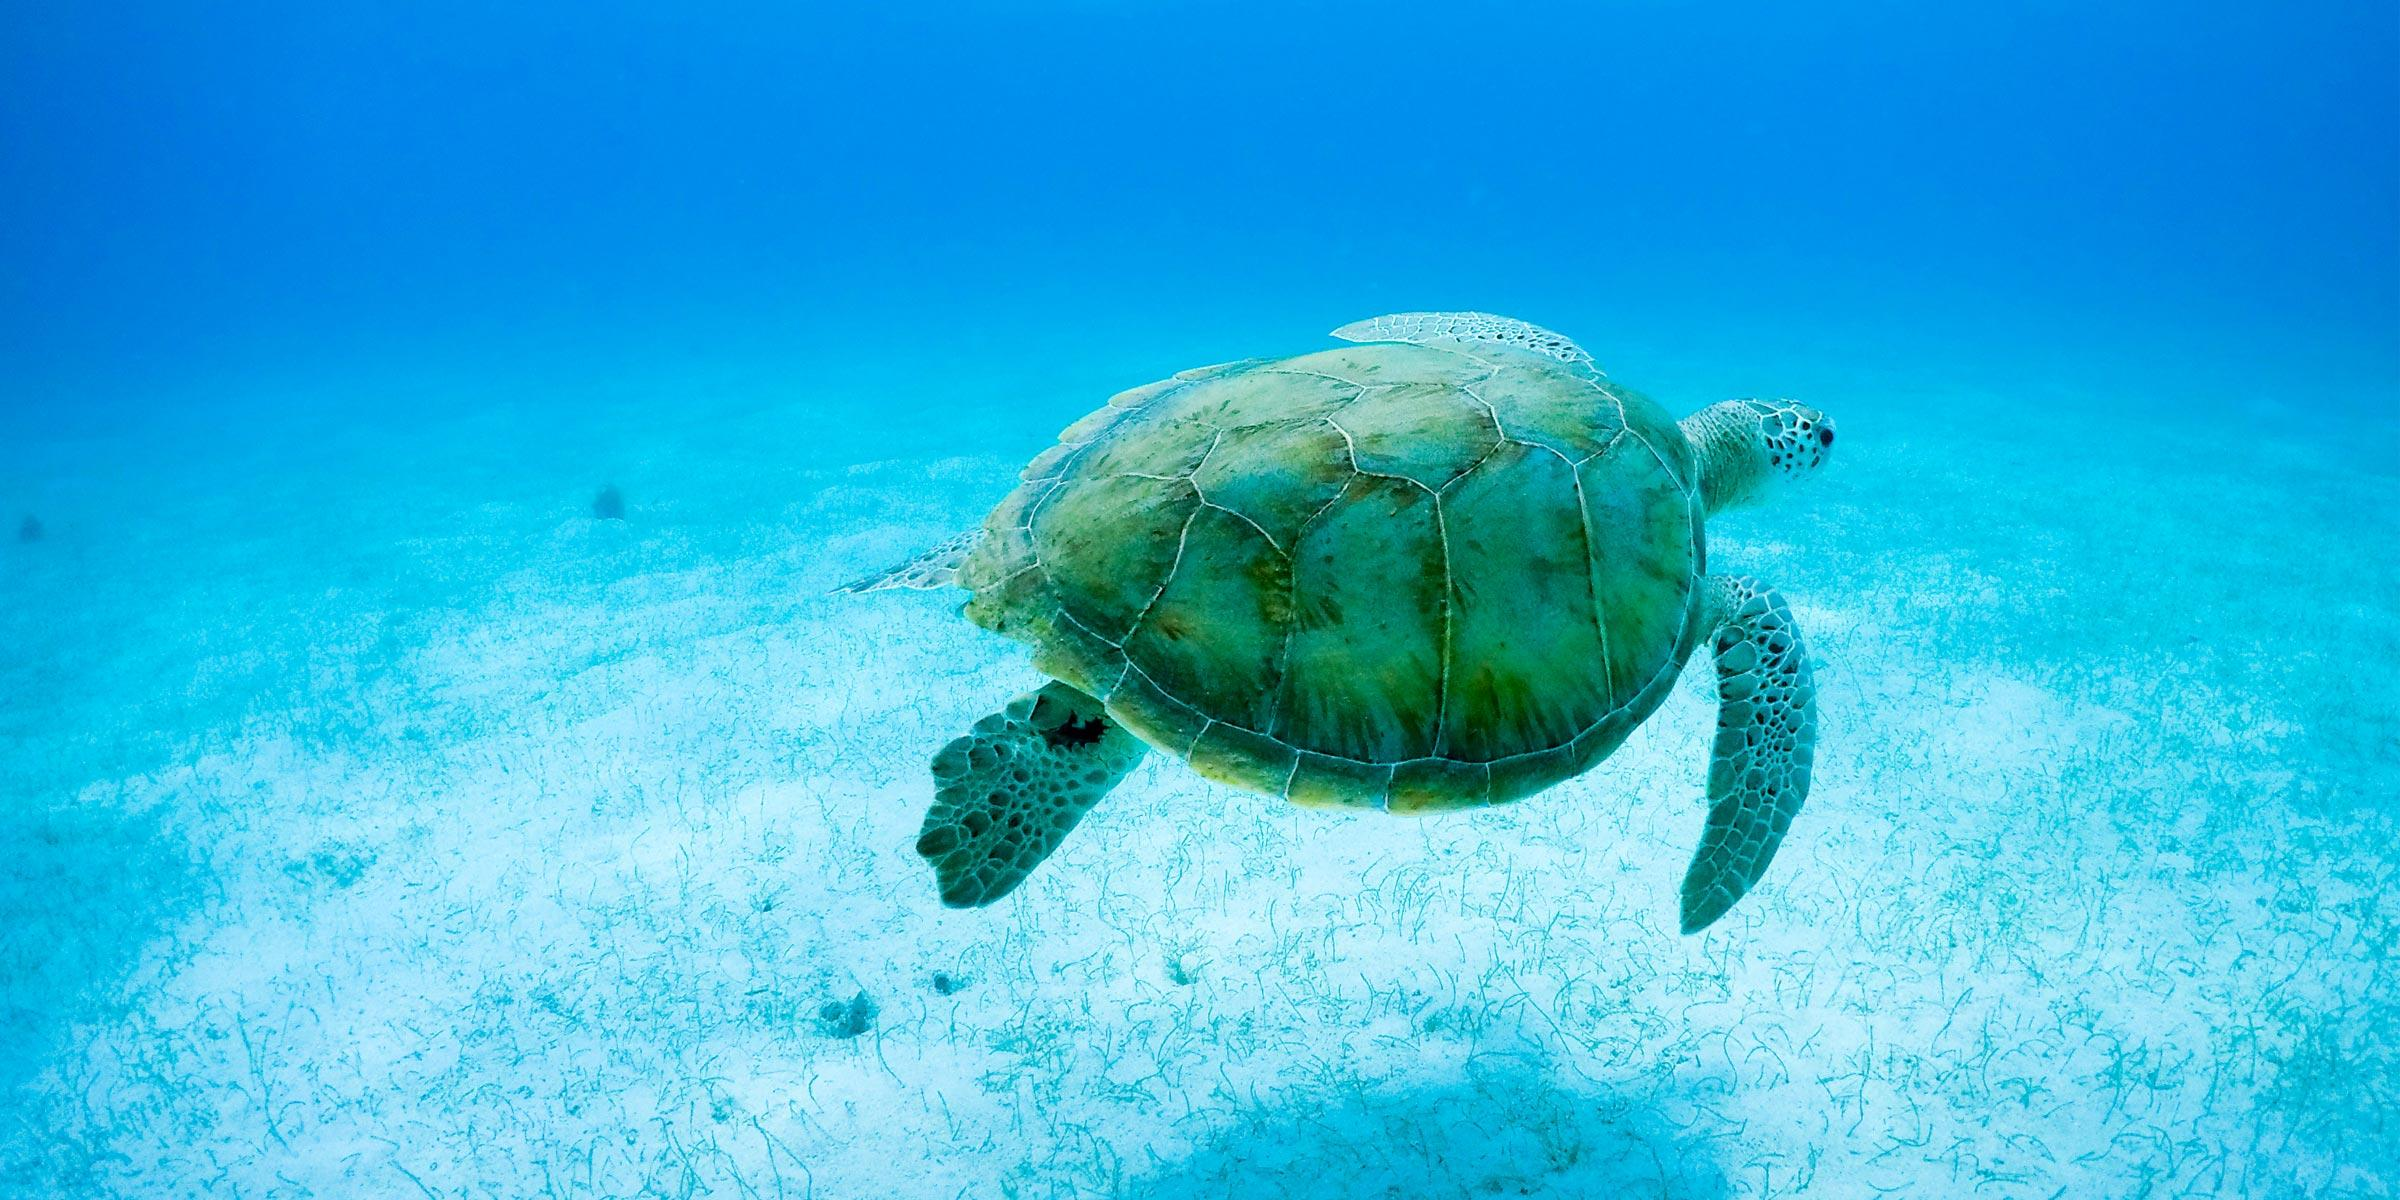 Sea turtle swimming in the Caribbean